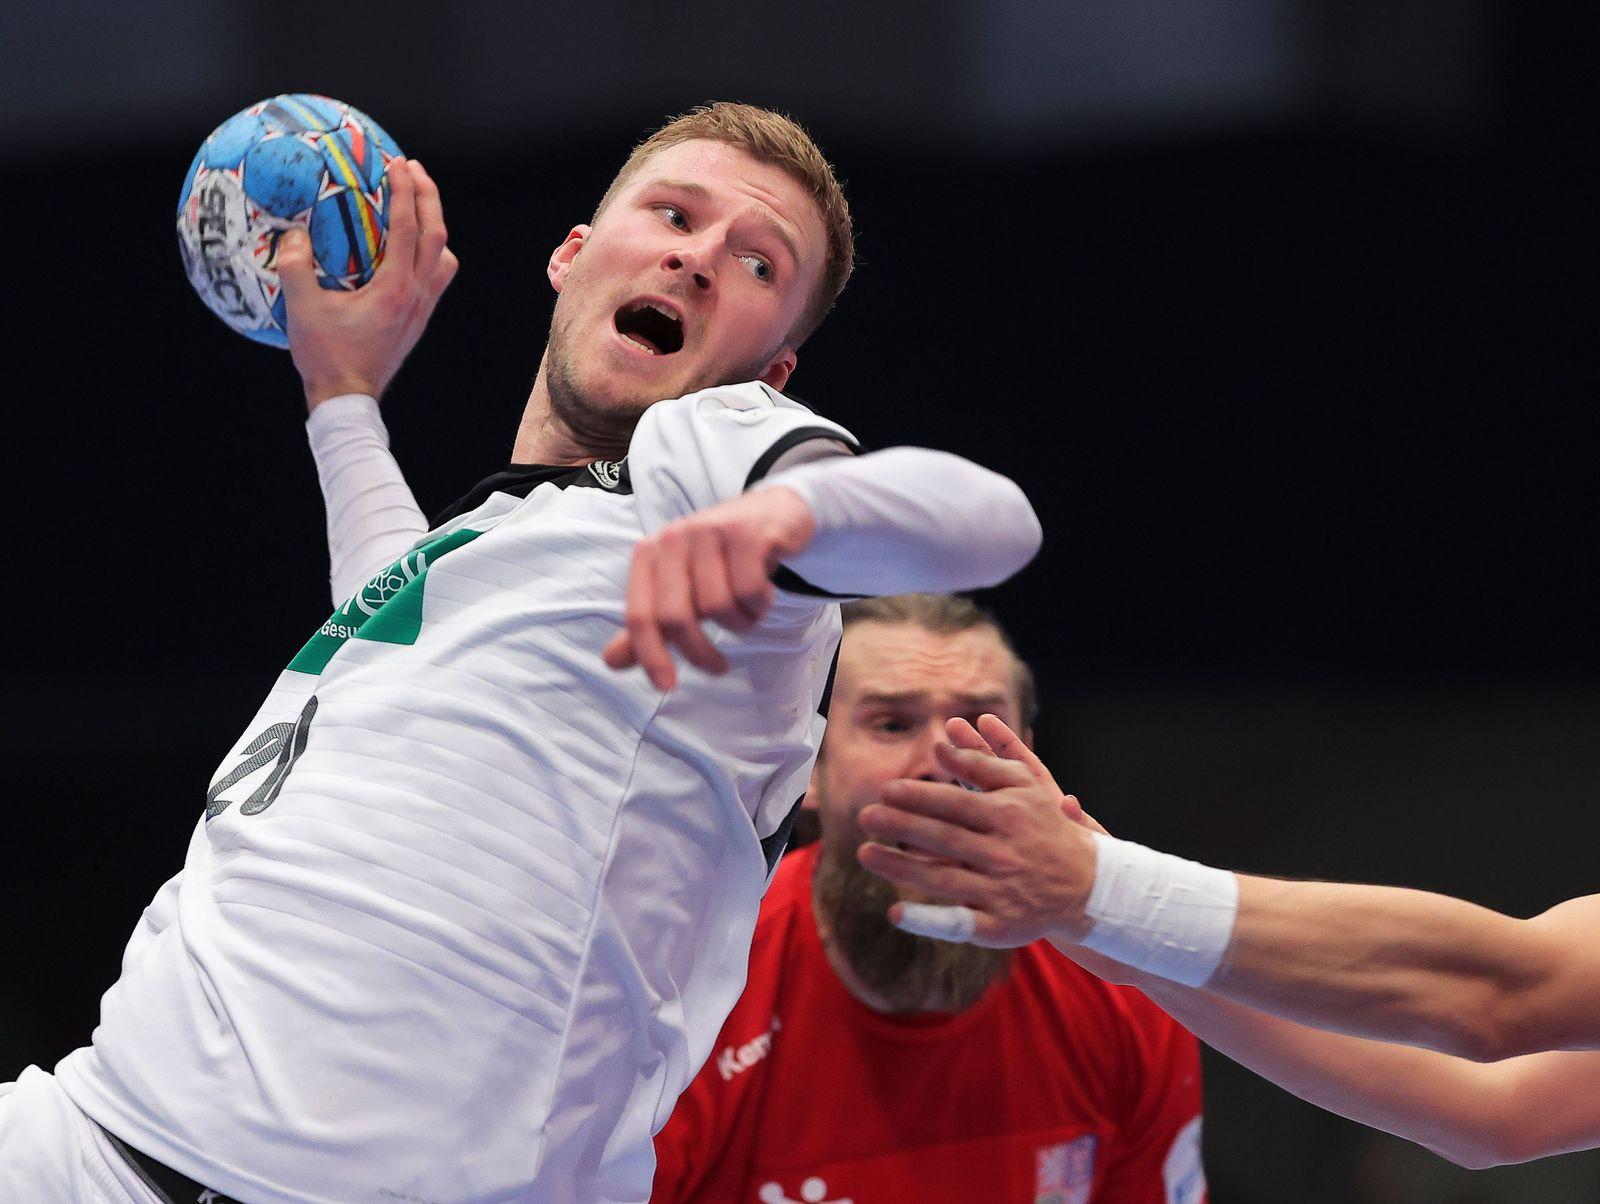 EHF Handball Men European Championship, Vienna, Austria - 22 Jan 2020